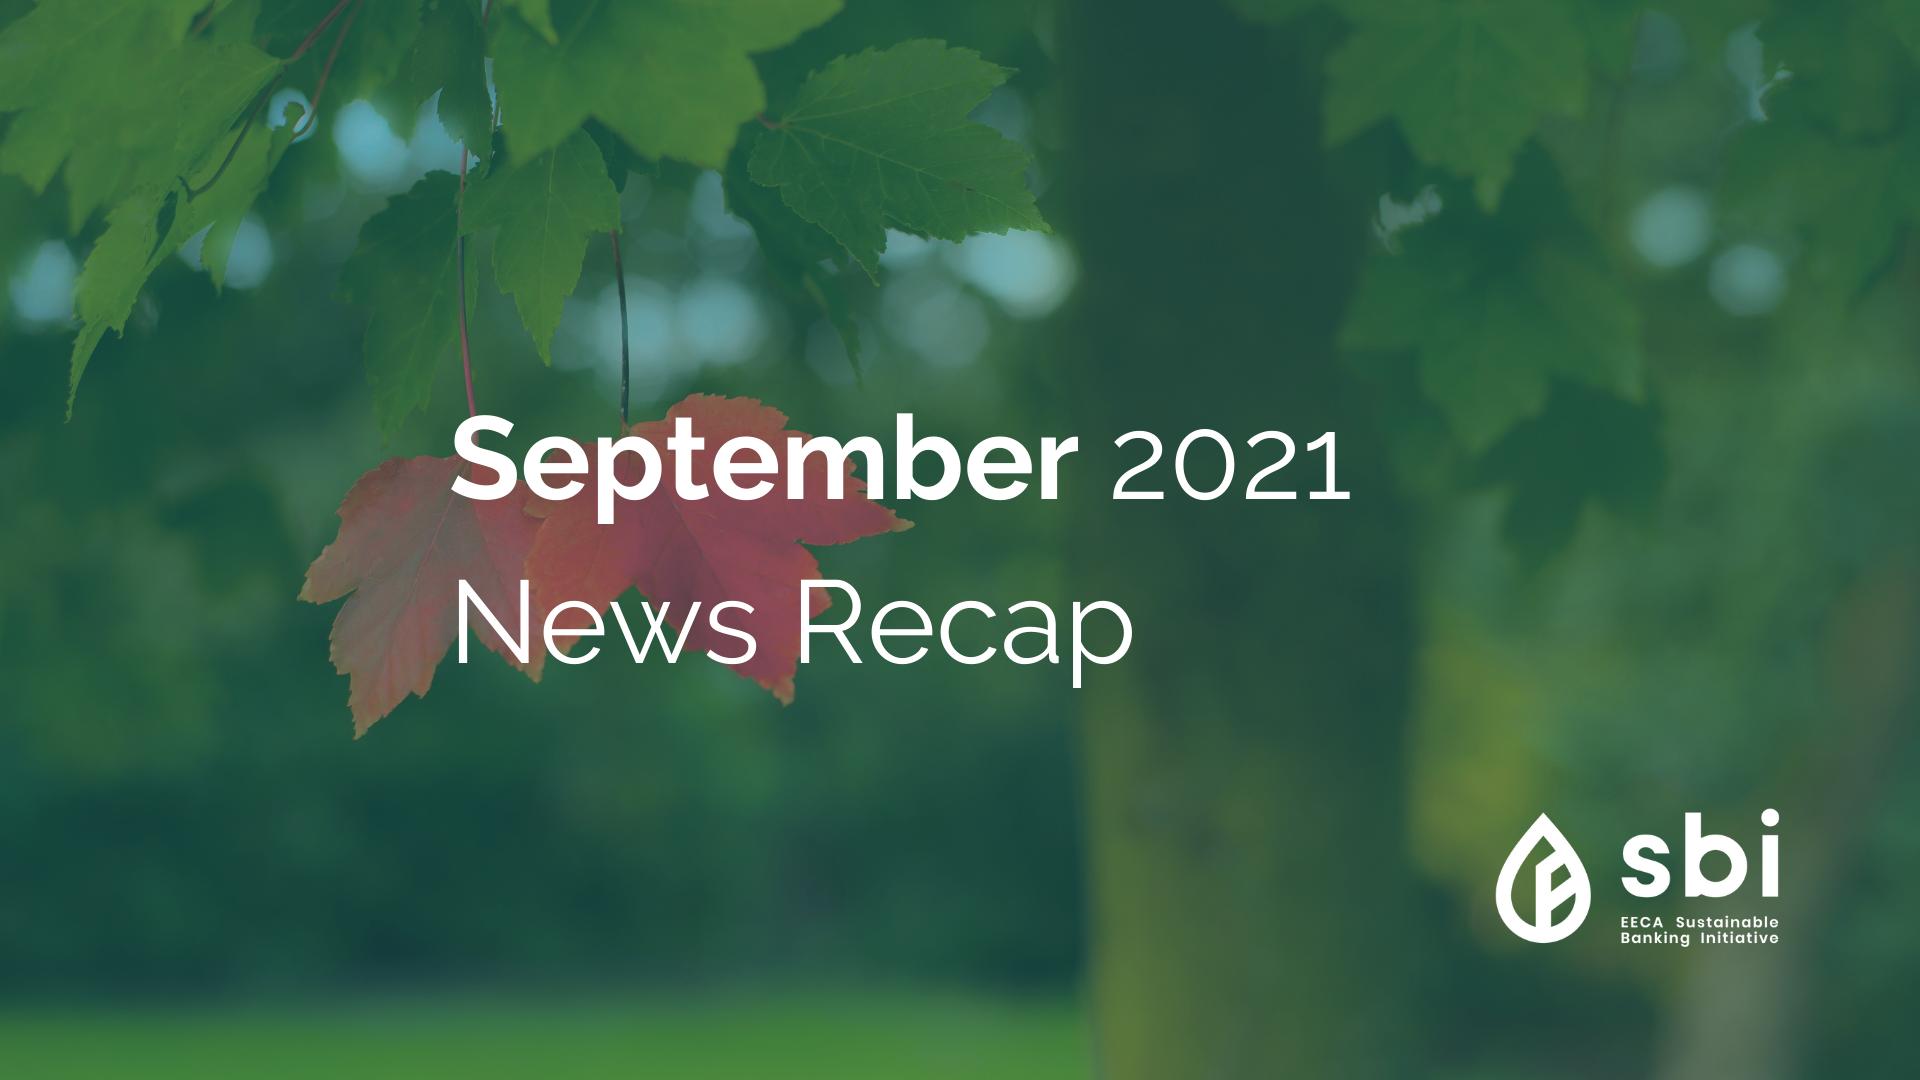 September 2021 News Recap